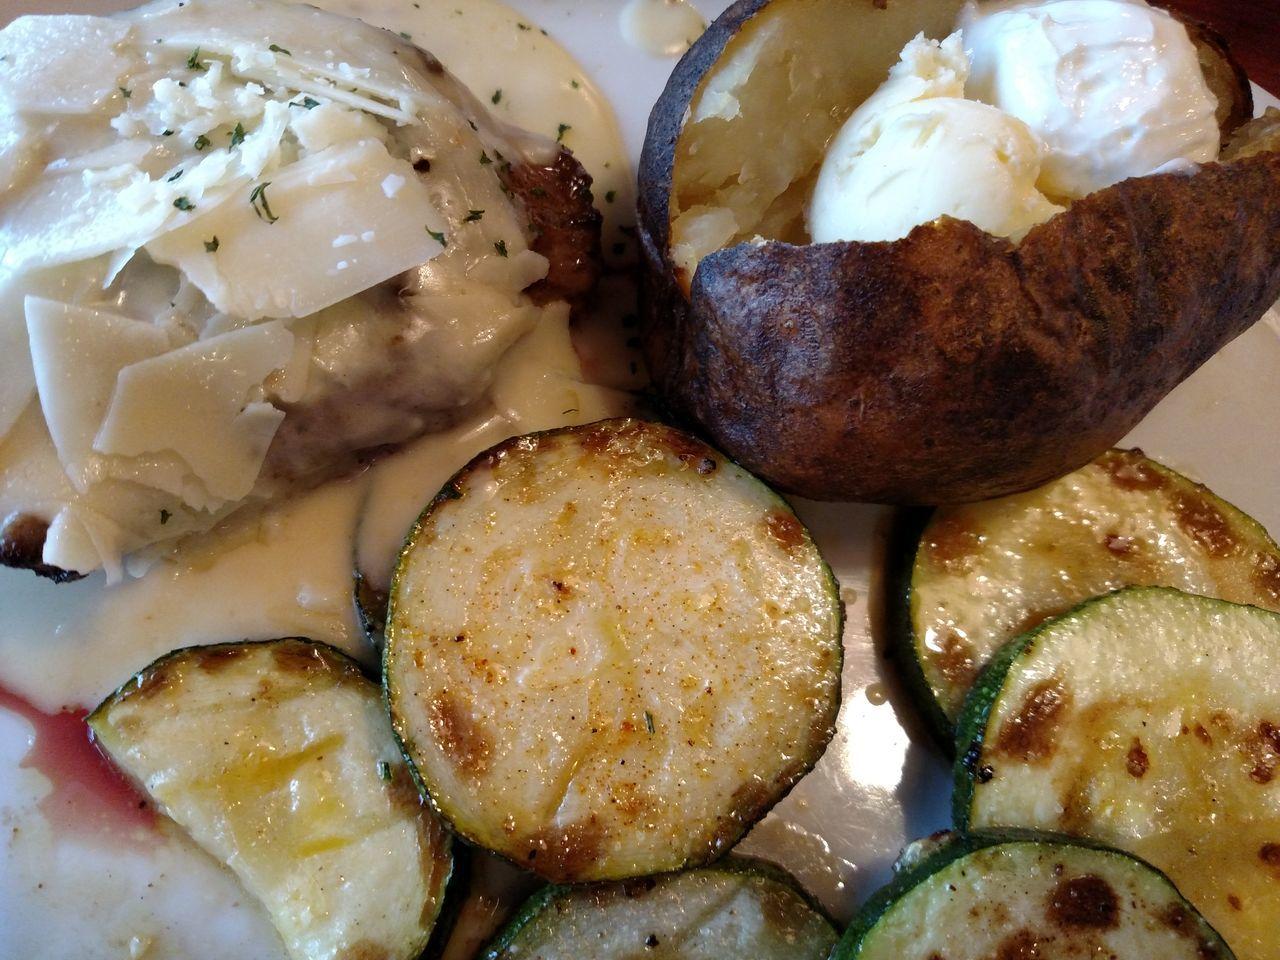 Food Photography Food Porn Eyeem Dinner Club Steak Dinner Asiago Steak Baked Potato Grilled Zucchini Zucchini Whats For Dinner? Bon Appetite Food Food Presentation